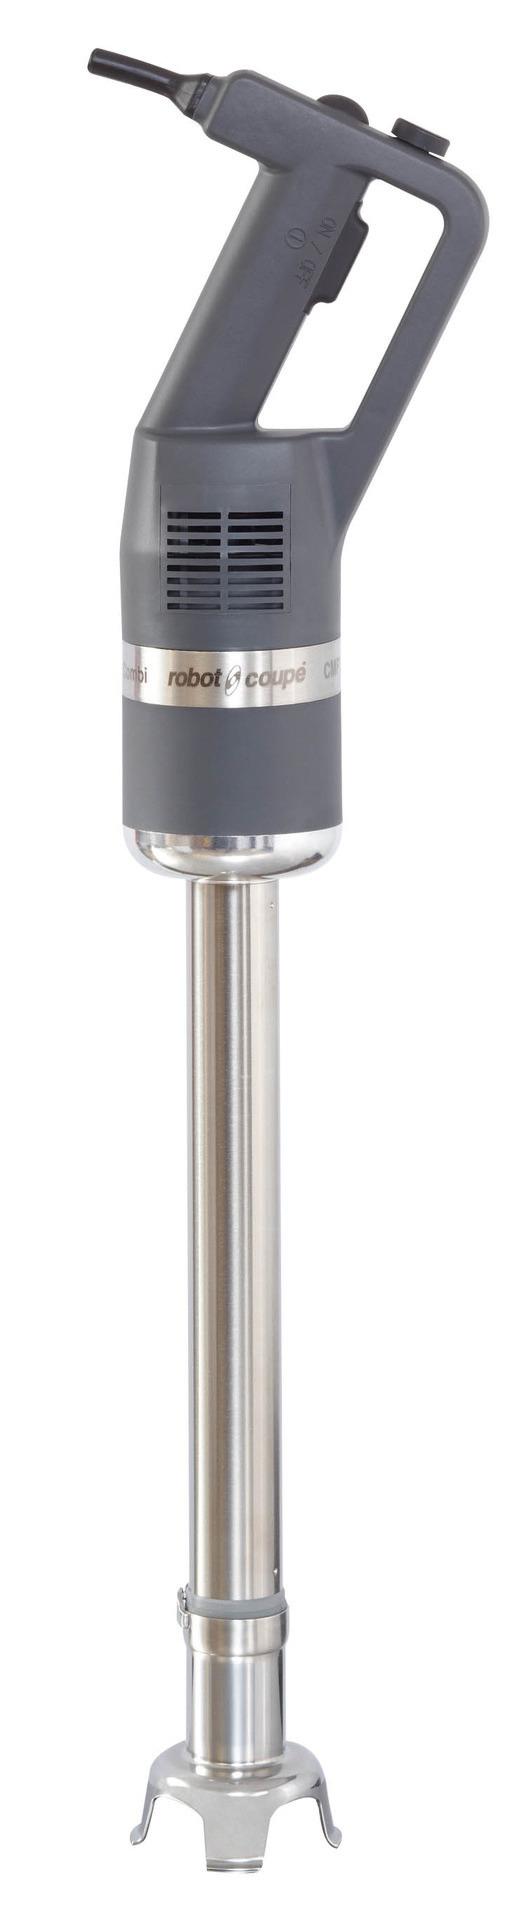 Stabmixer CMP 400 mm / 230 V / 0,42 kW